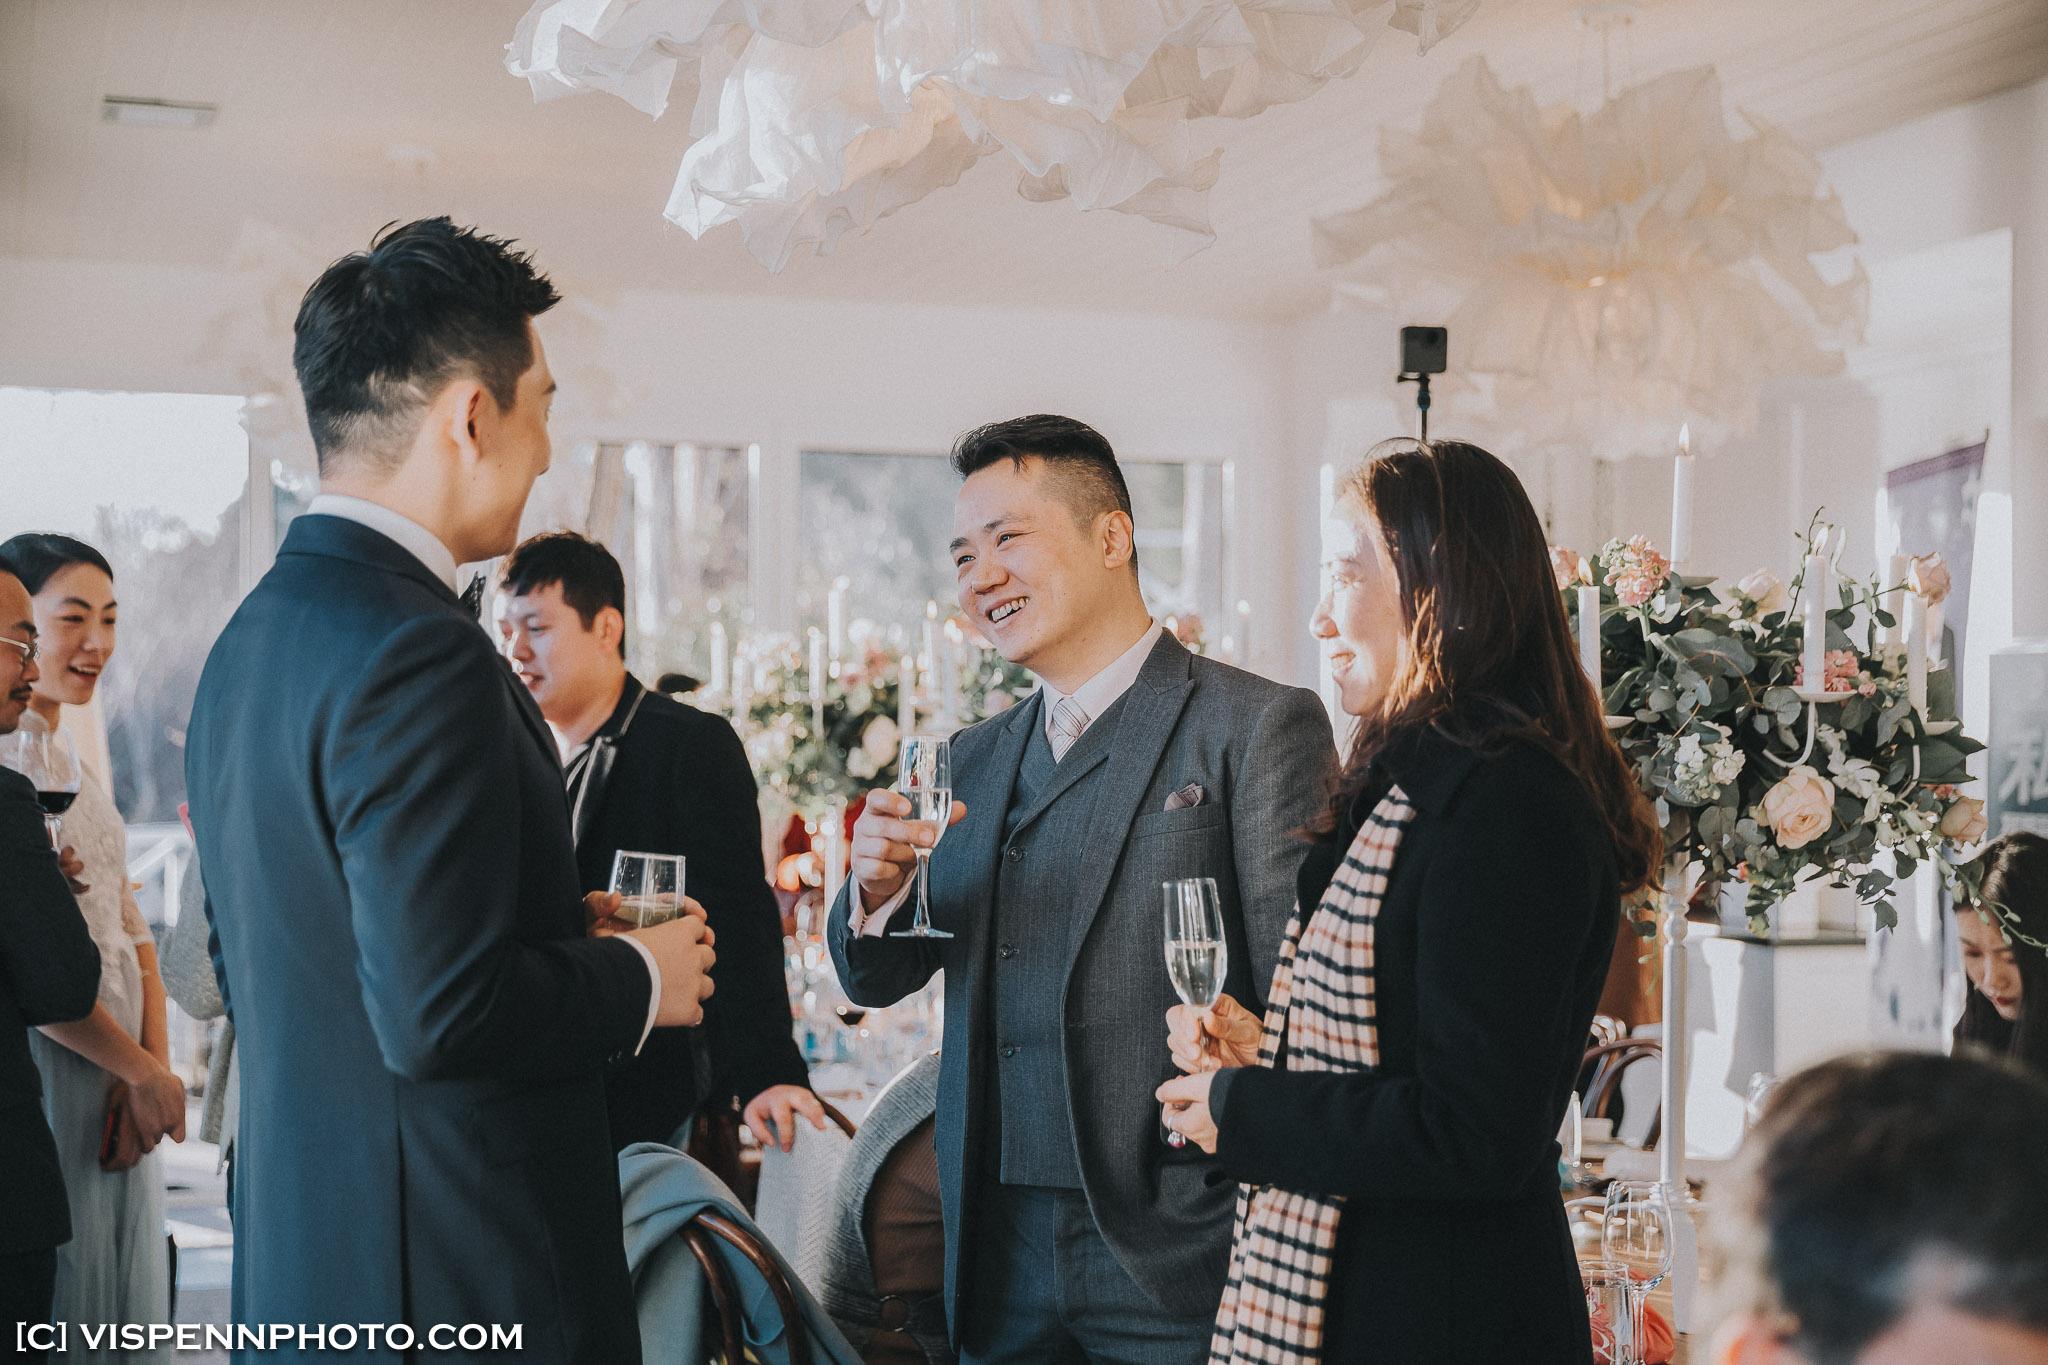 WEDDING DAY Photography Melbourne VISPENN 墨尔本 婚礼跟拍 婚礼摄像 婚礼摄影 结婚照 登记照 VISPENN 1DX 4063